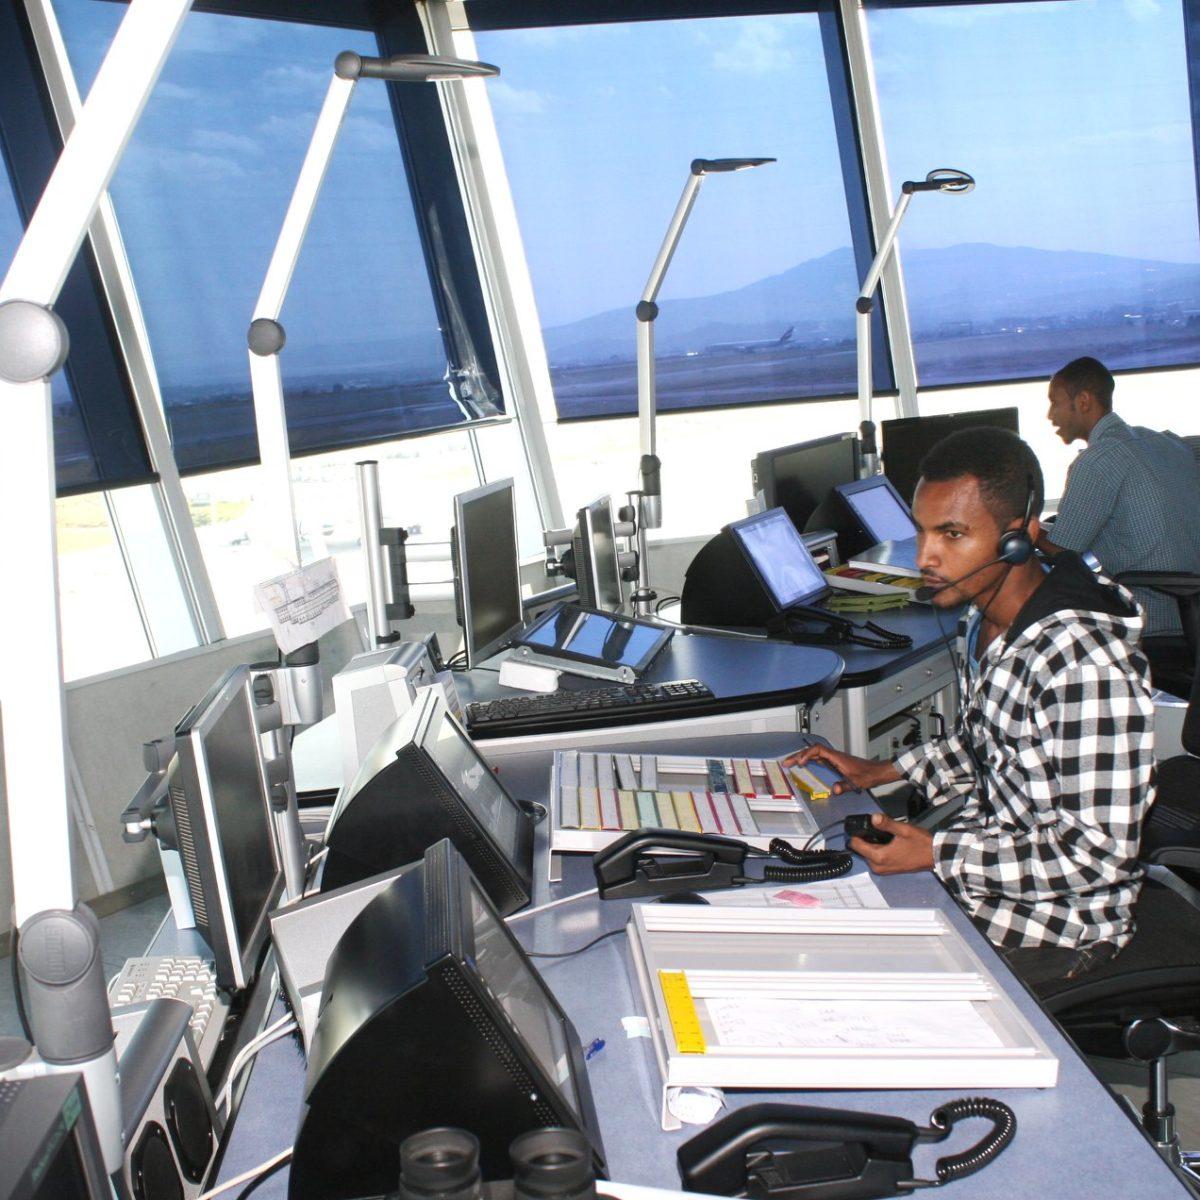 Ethiopia risking flight safety to cover up ATC strike